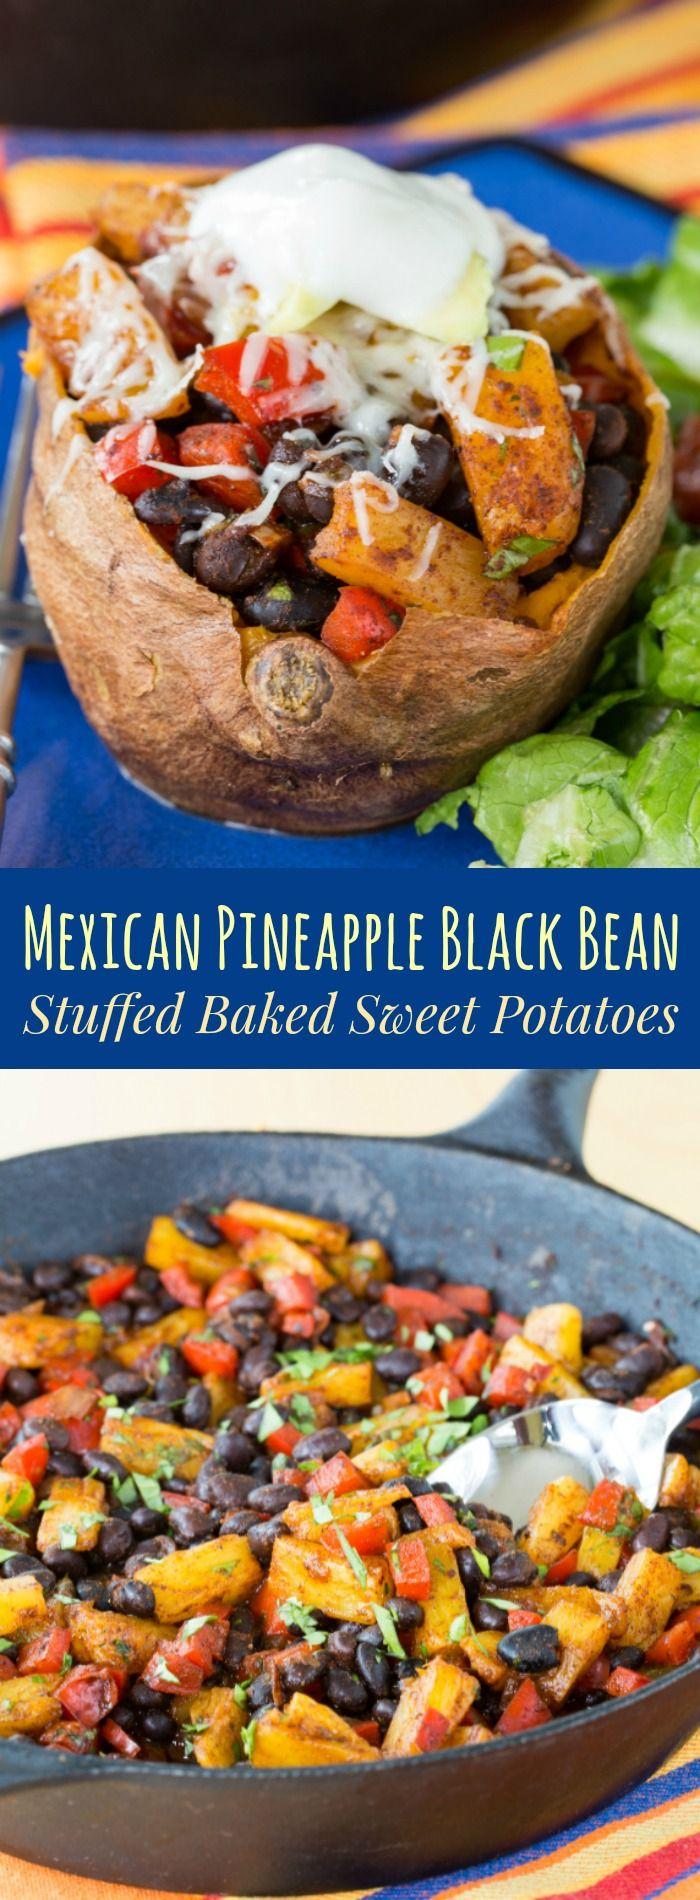 Mexican Pineapple Black Bean Stuffed Baked Sweet Potatoes